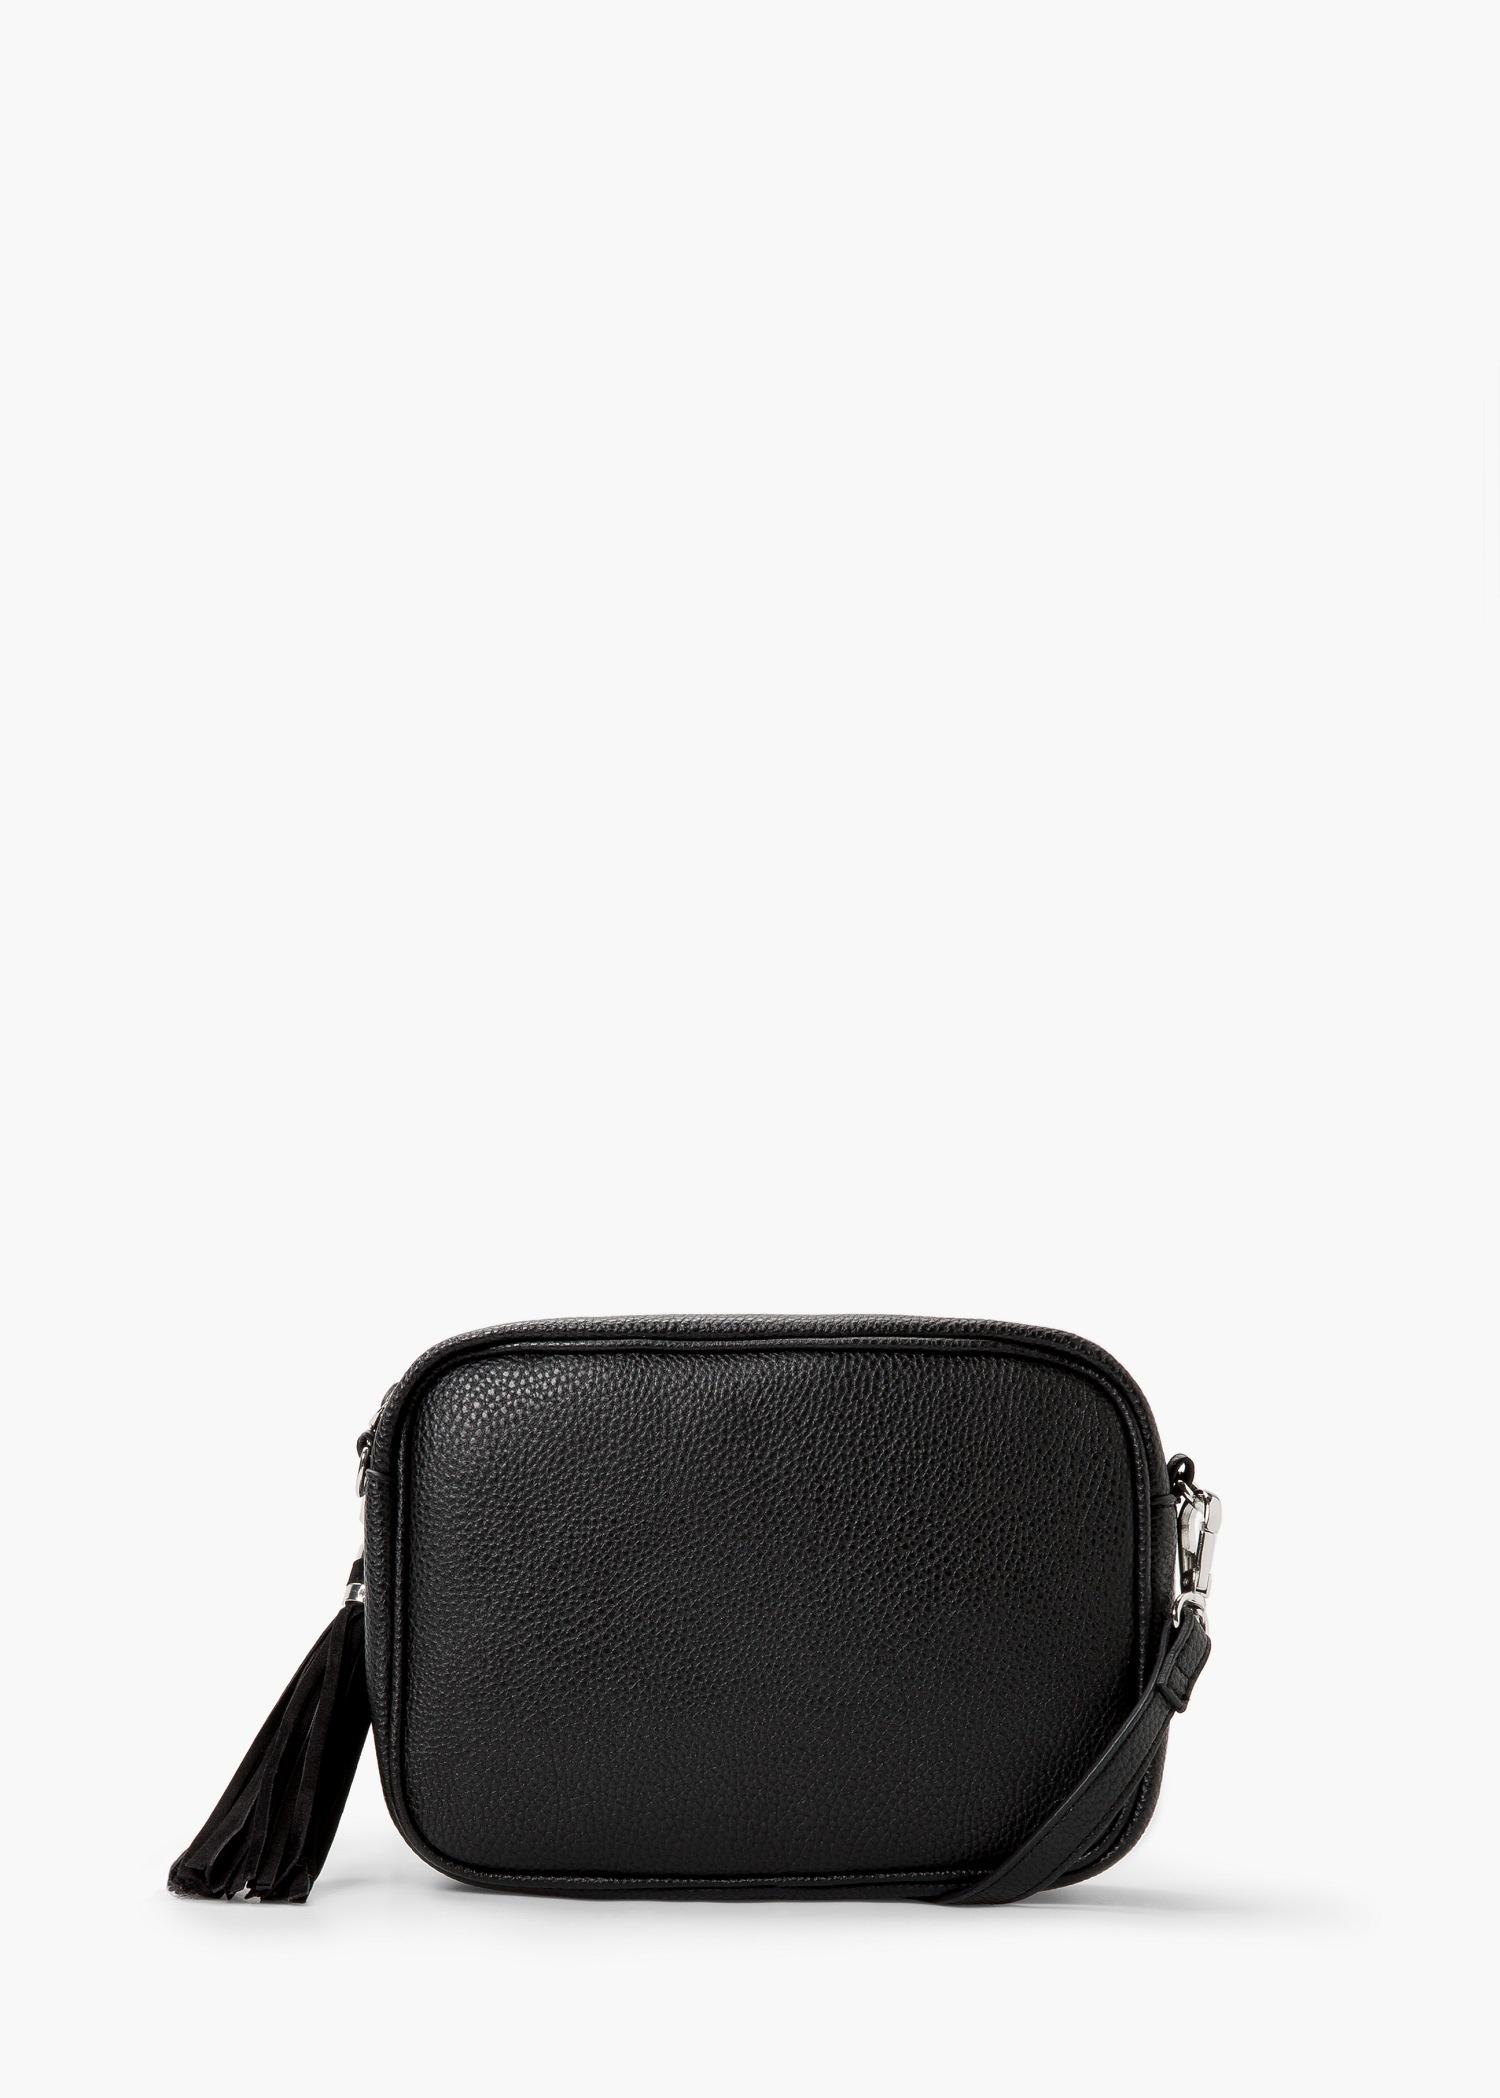 6bab883b656d Mango Cross-body Small Bag in Black - Lyst